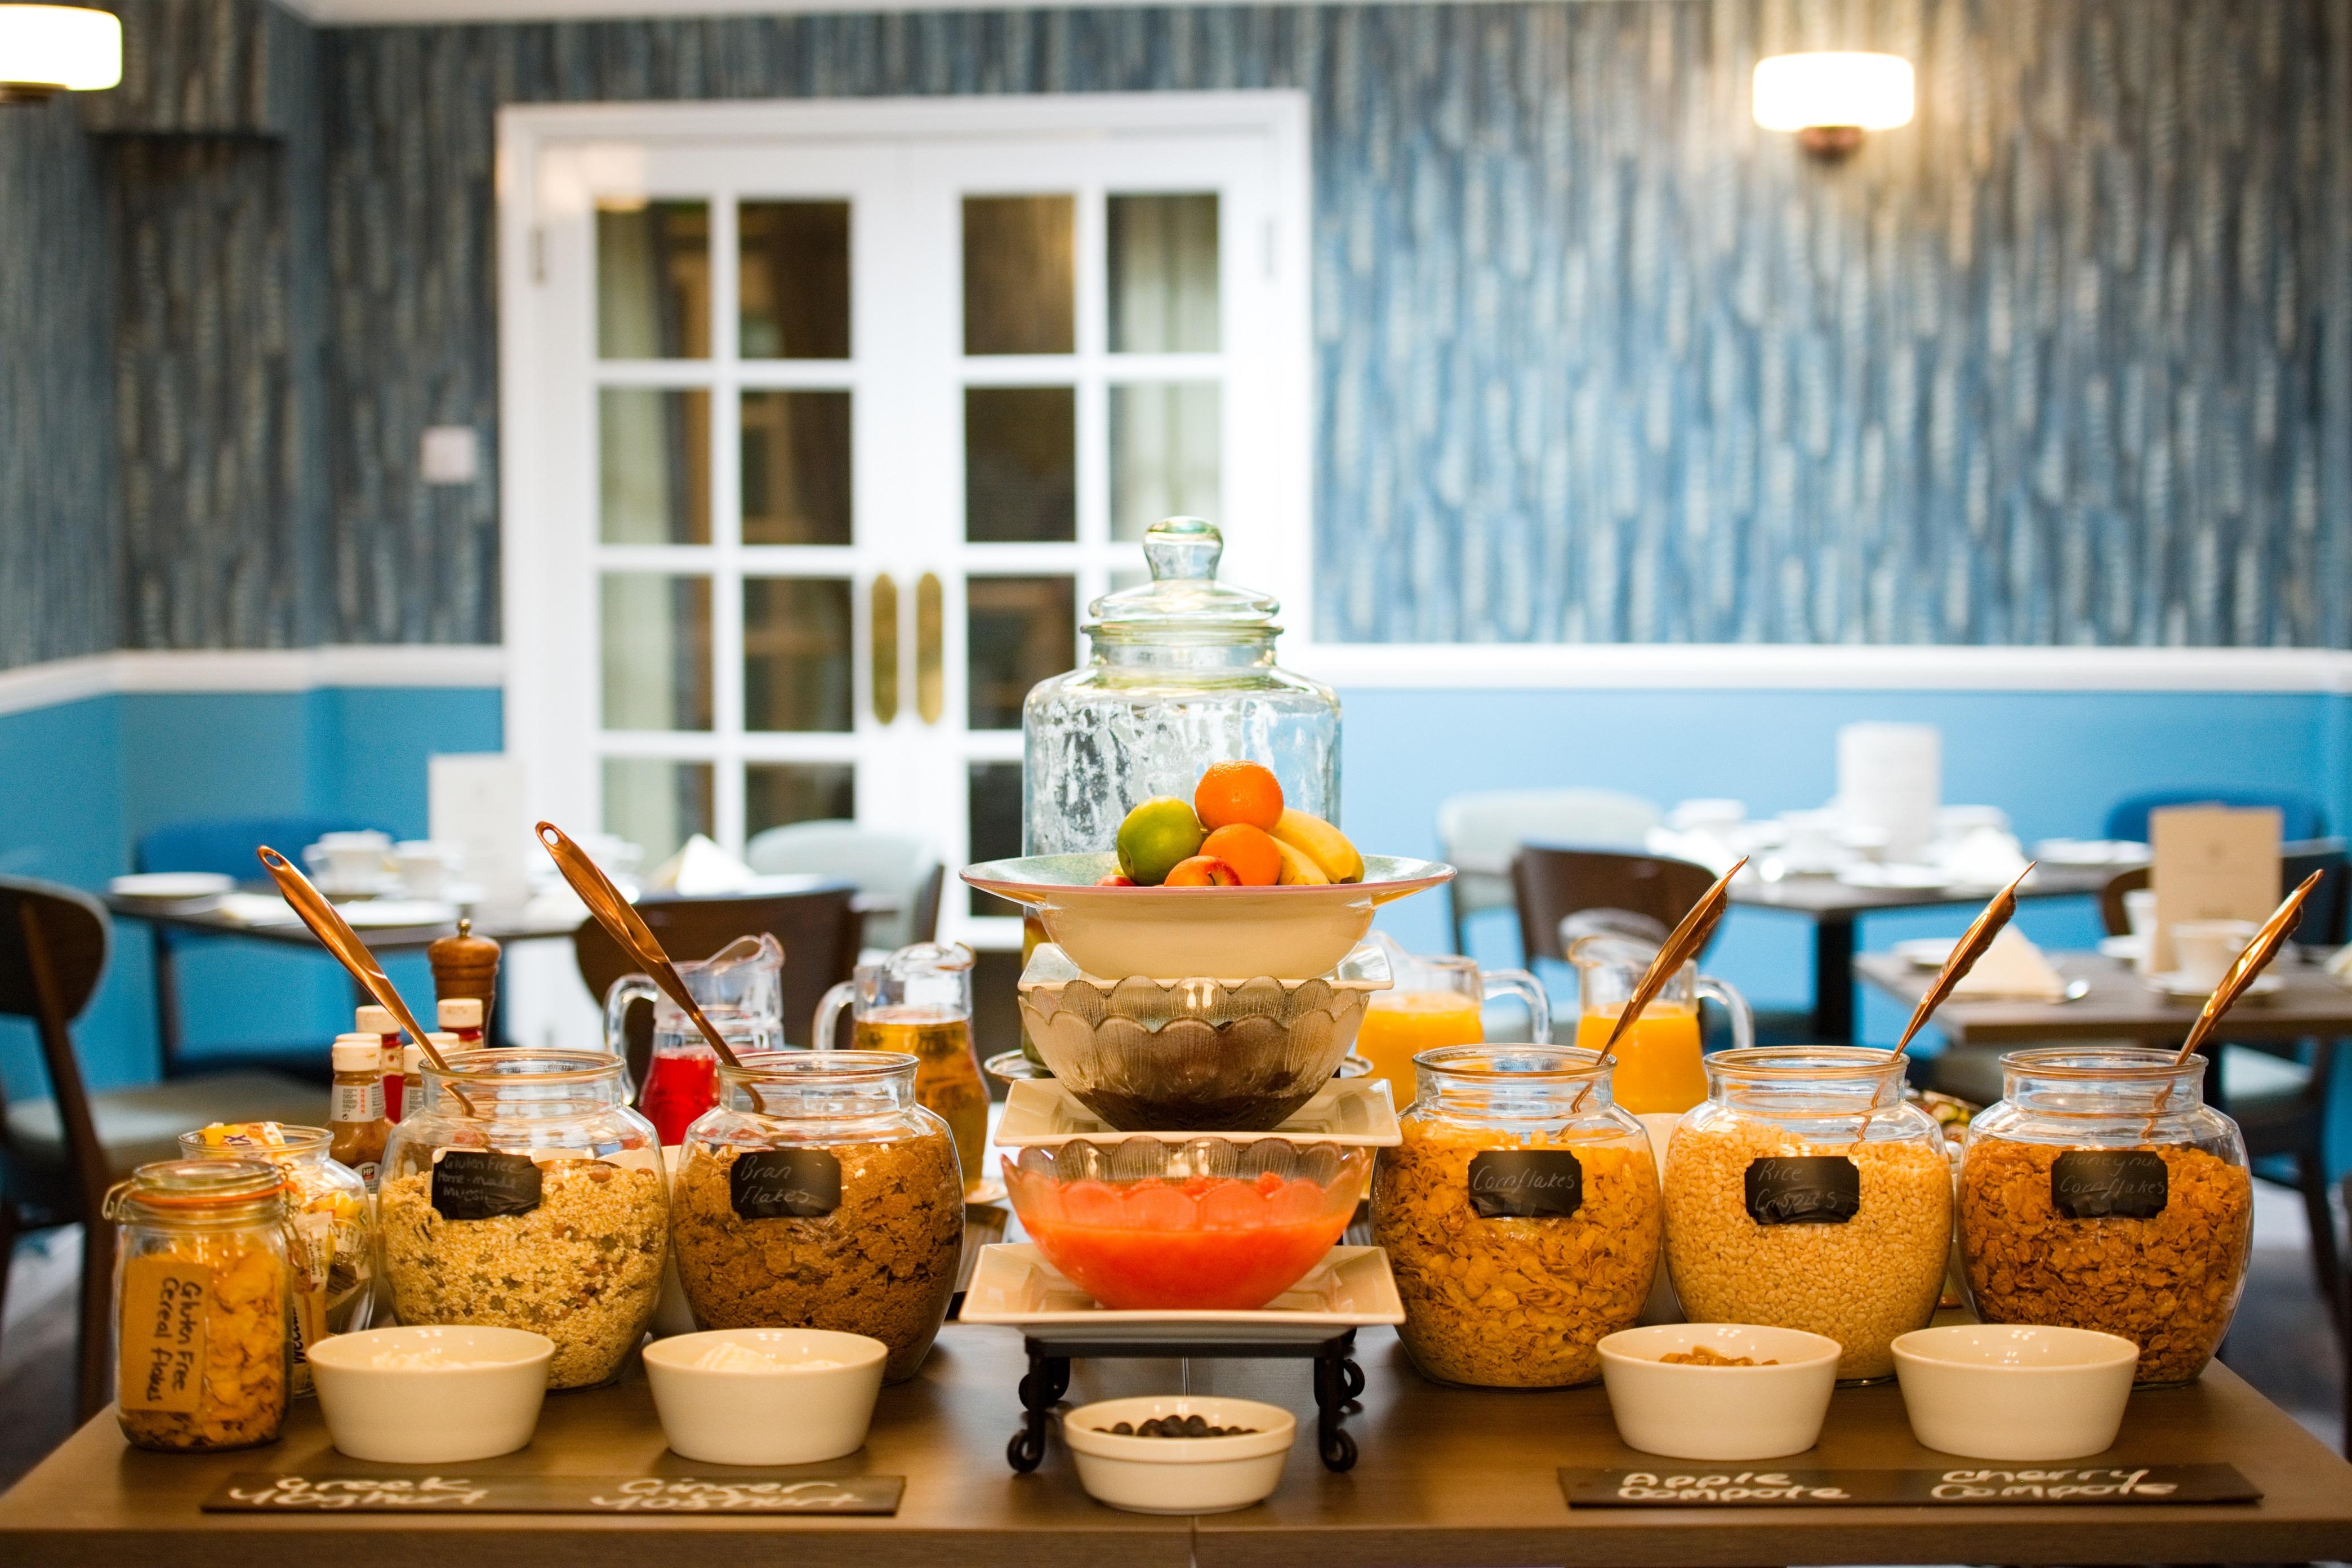 Wisteria Hotel Breakfast